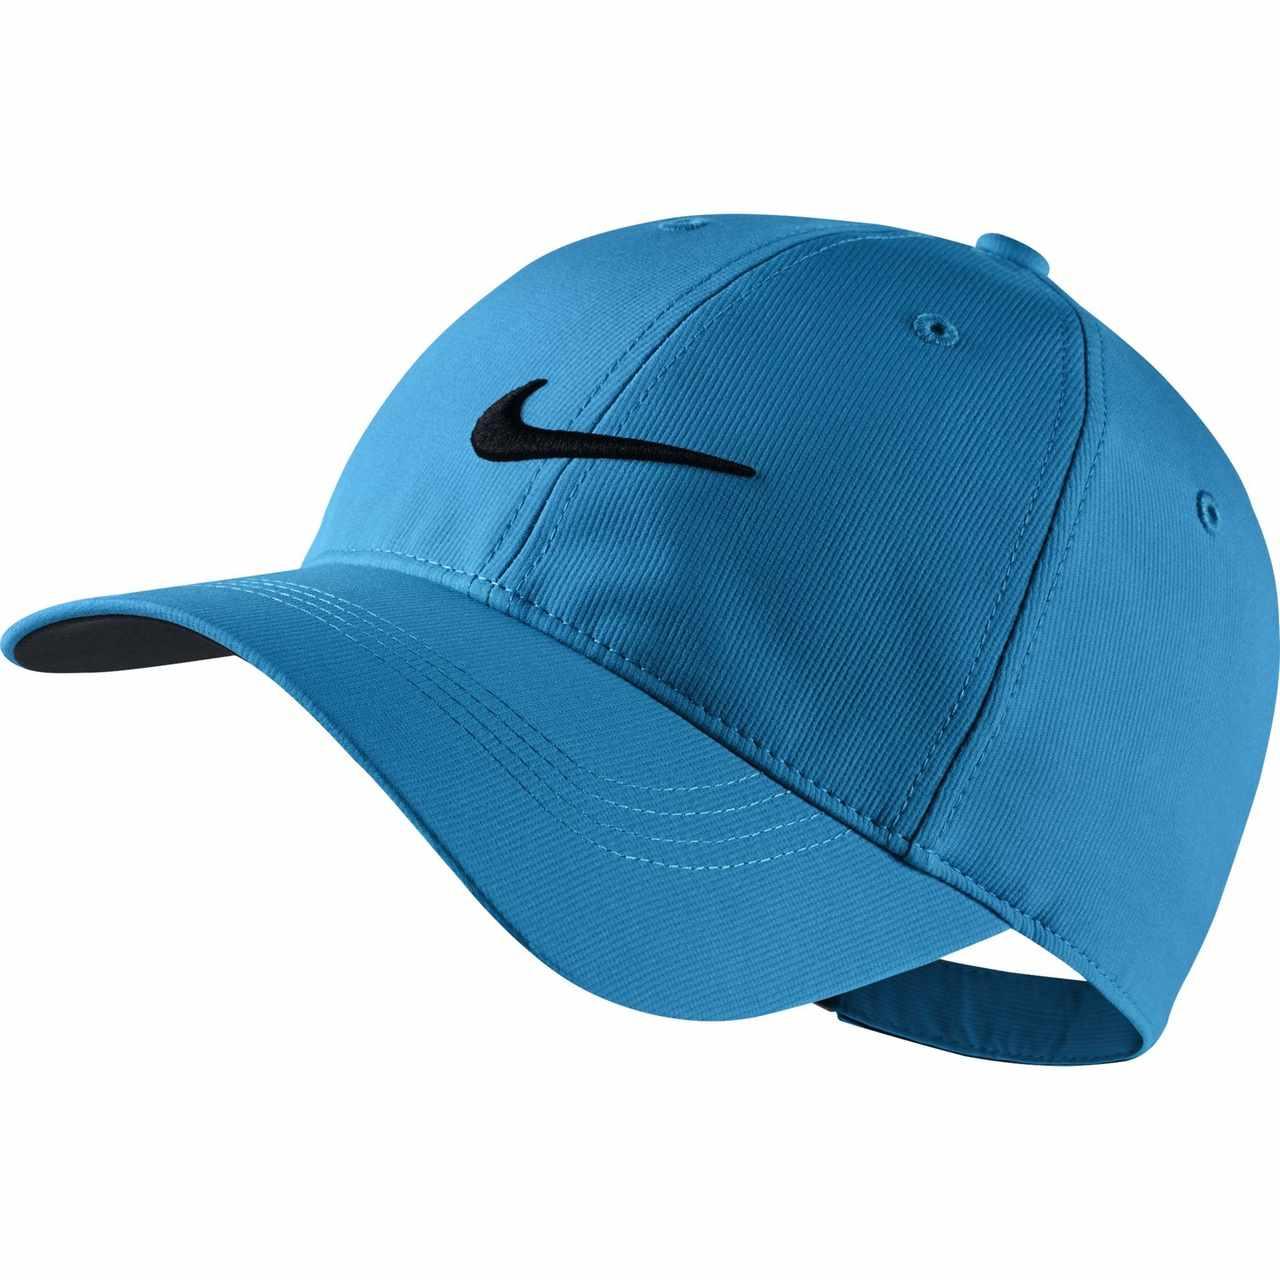 Nike Golf Legacy 91 Tech Adjustable Hat (Photo Blue Black) - Valor ... 066457e4dcf